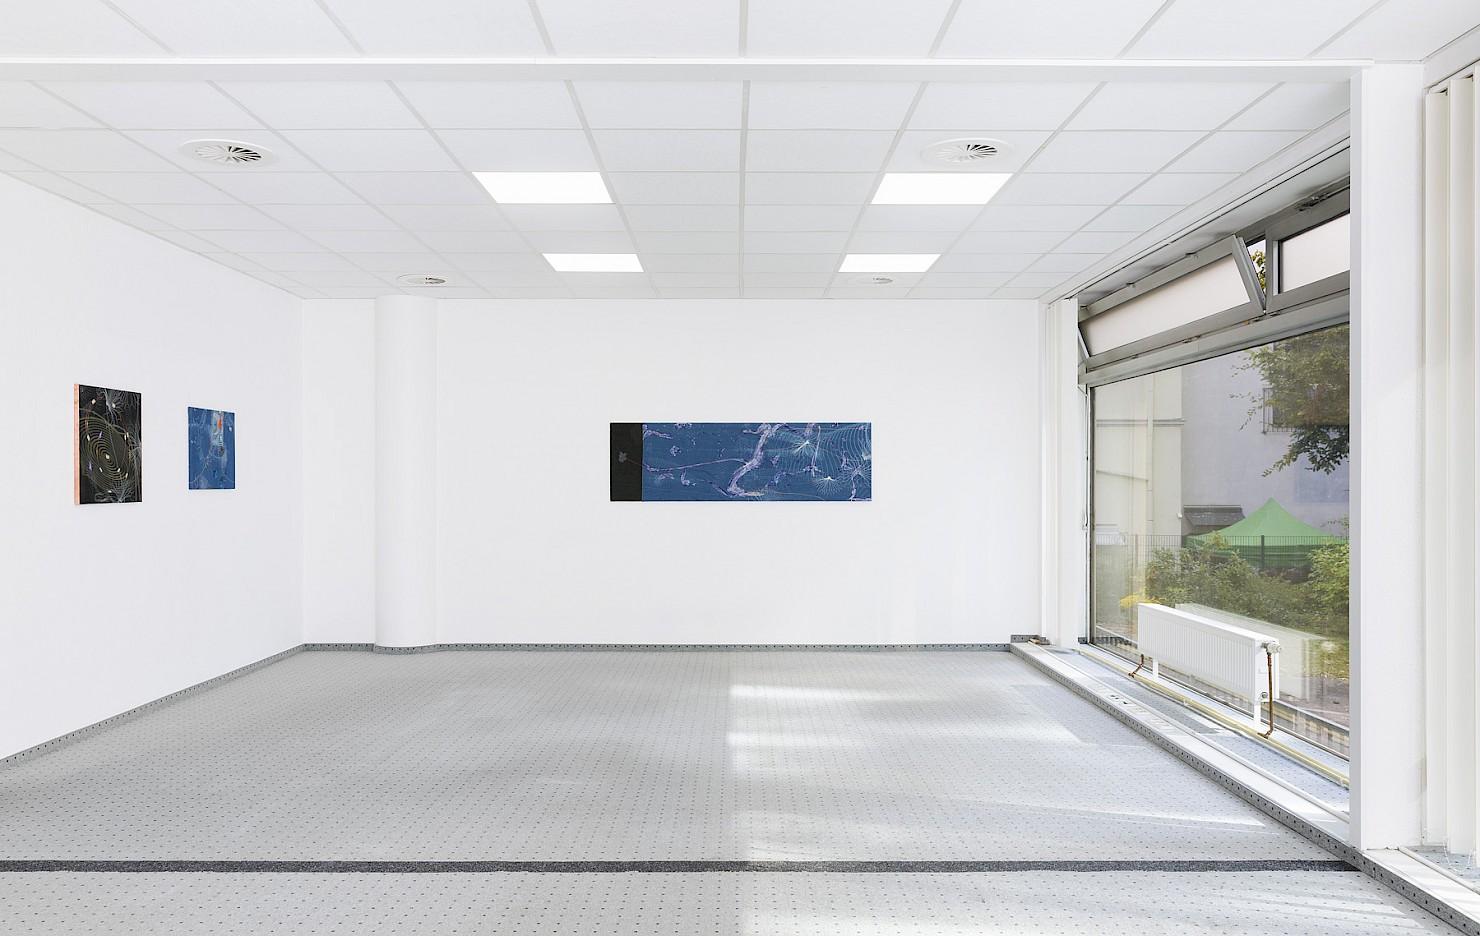 Conrad, installation view The Whistle, 2021, Schaumainkai 69, photo: Ivan Murzin